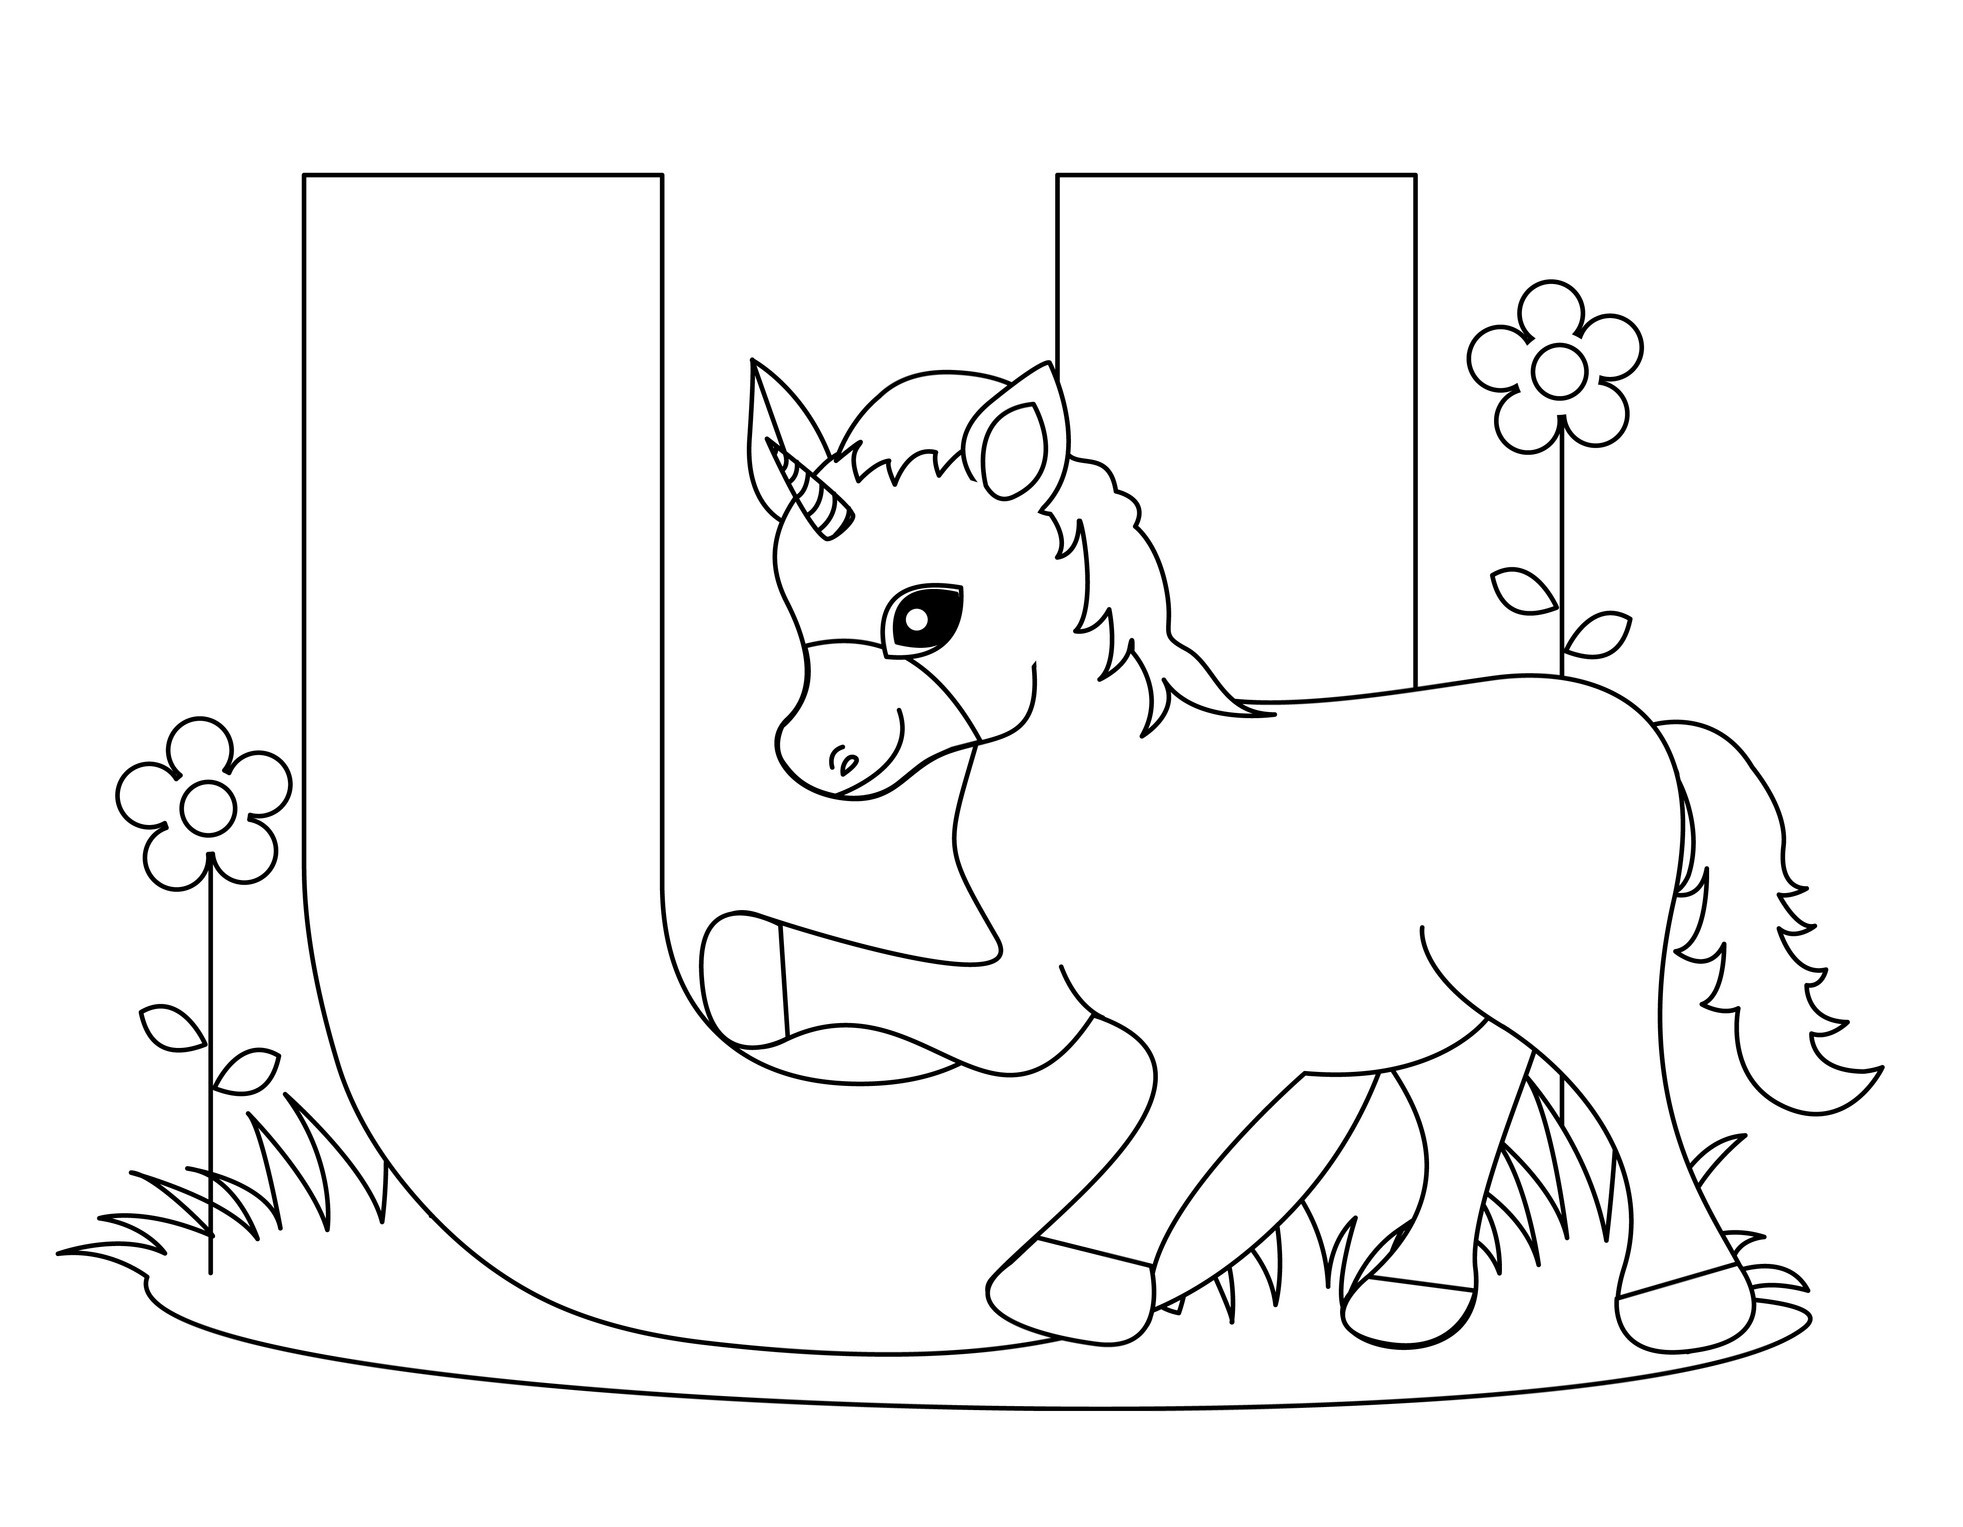 letter u coloring sheets free printable alphabet coloring pages for kids best coloring letter sheets u